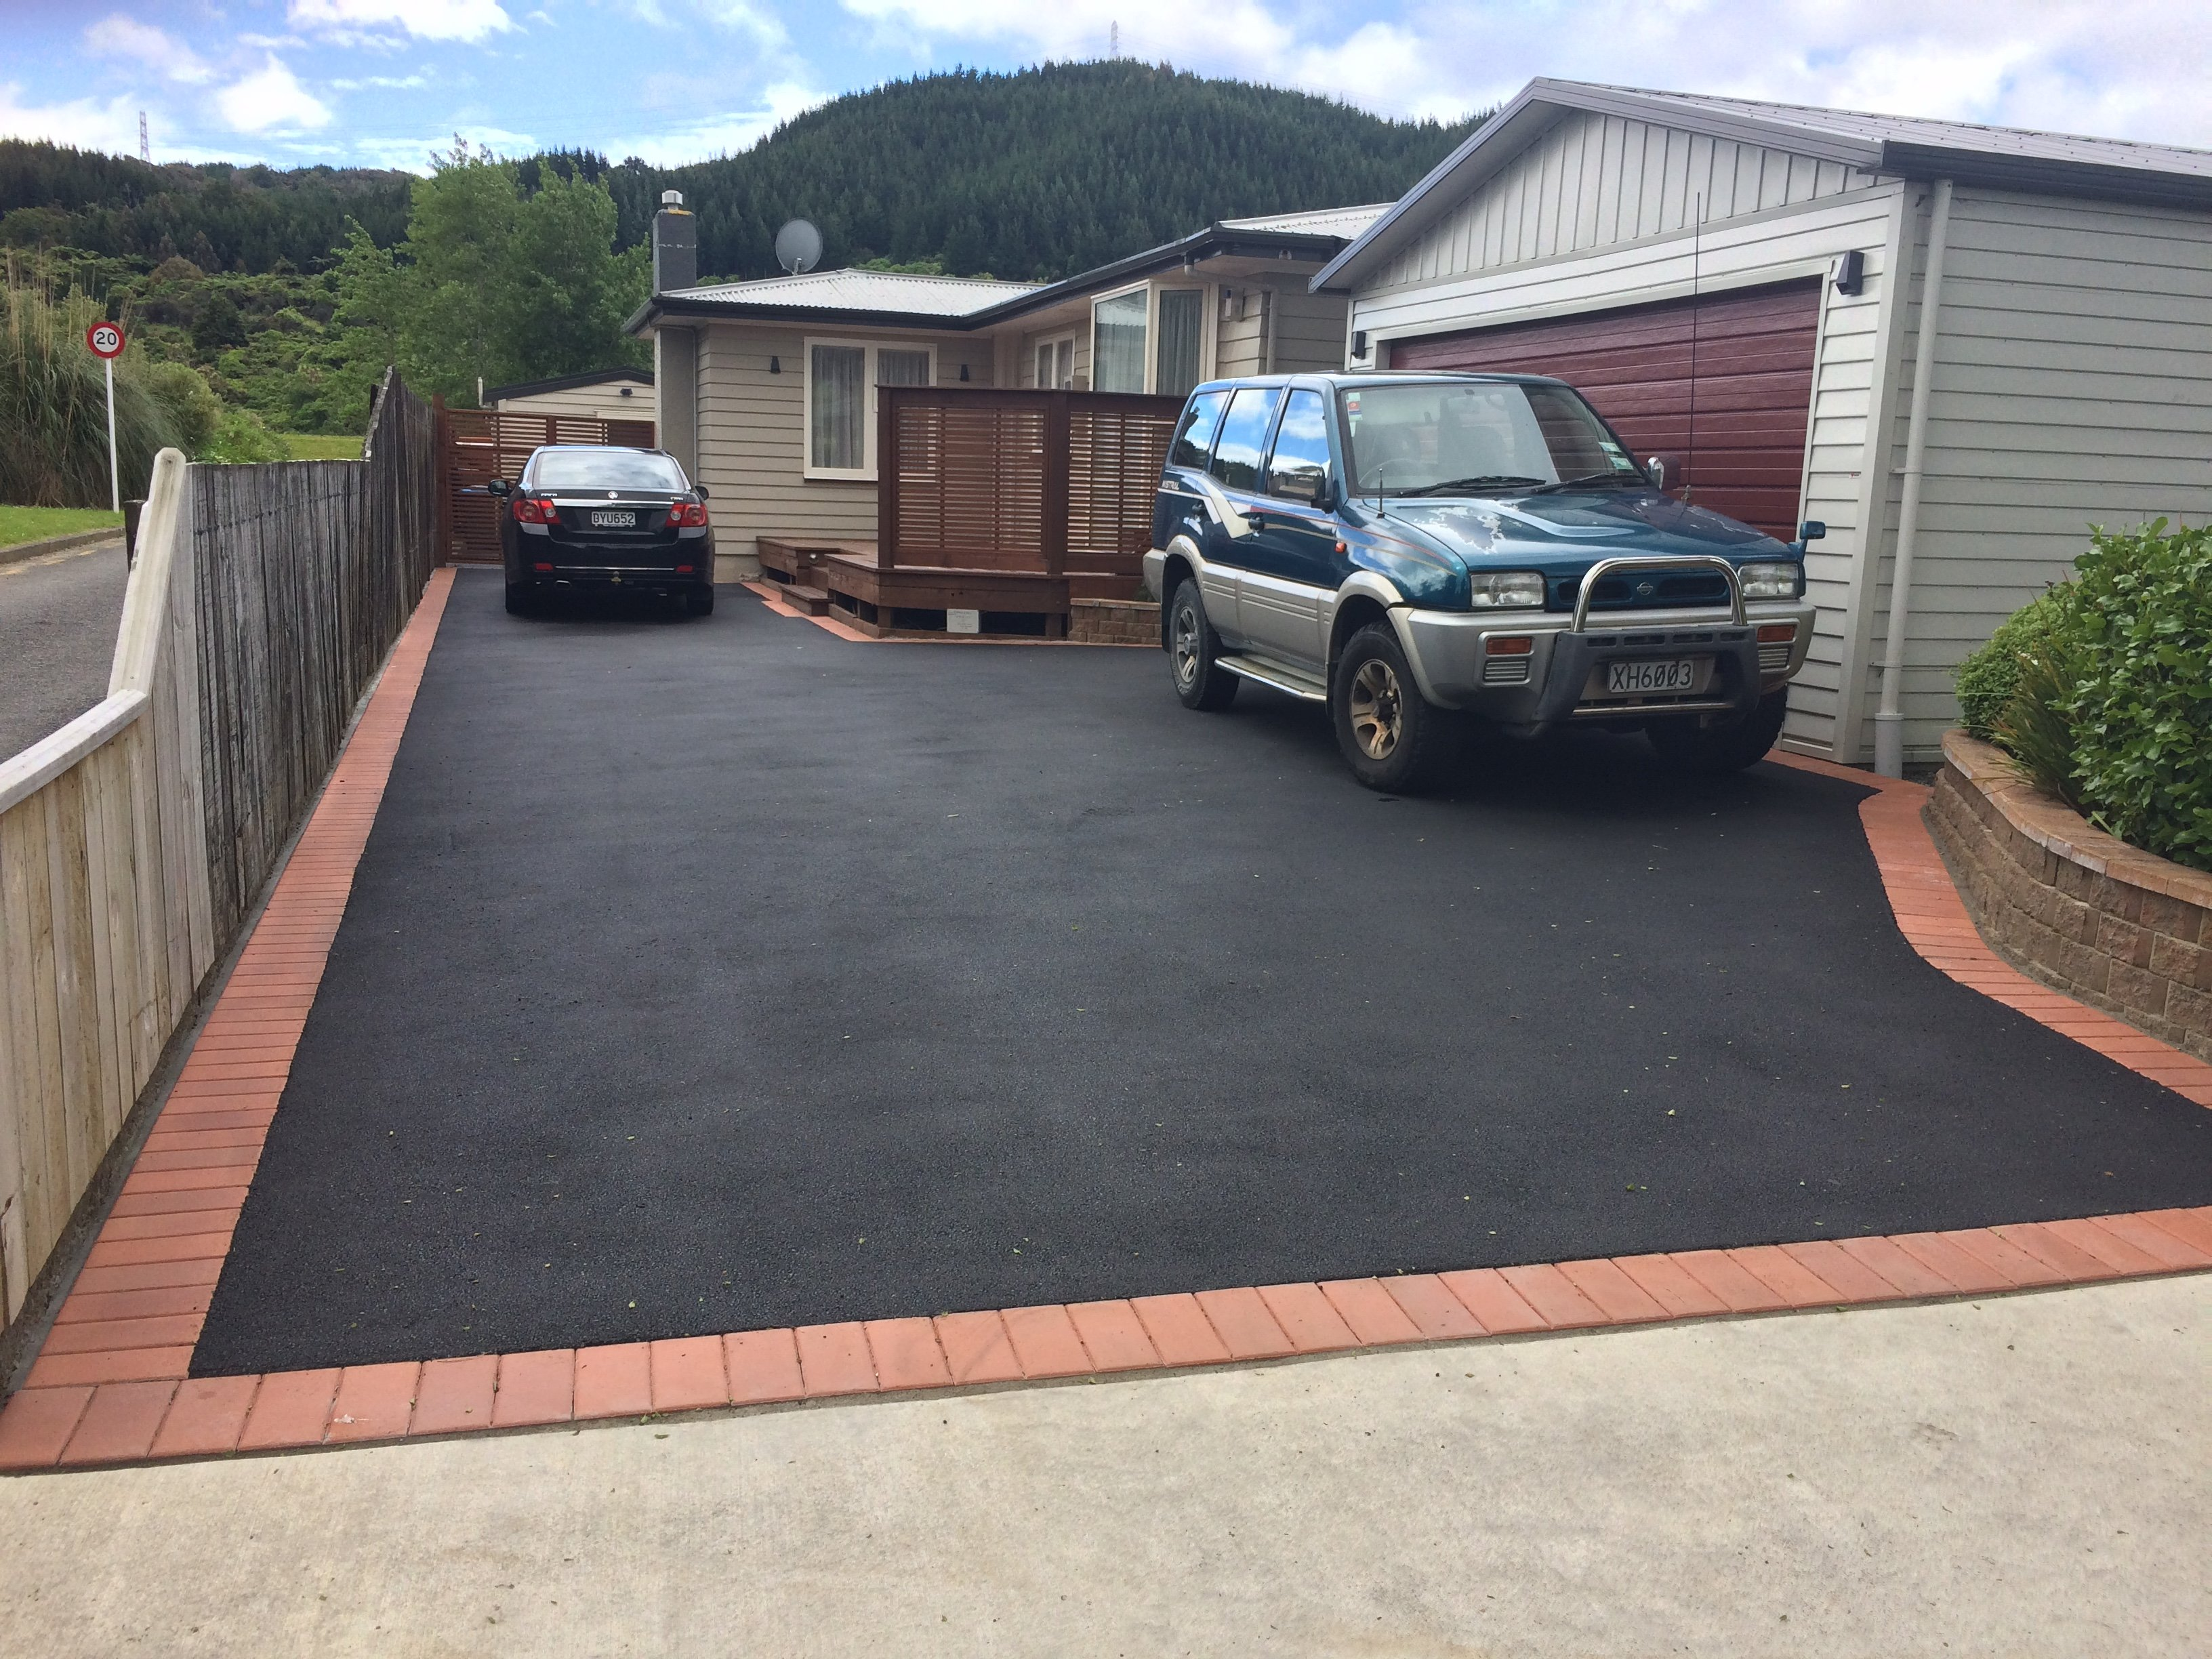 View of a newly built asphalt driveway